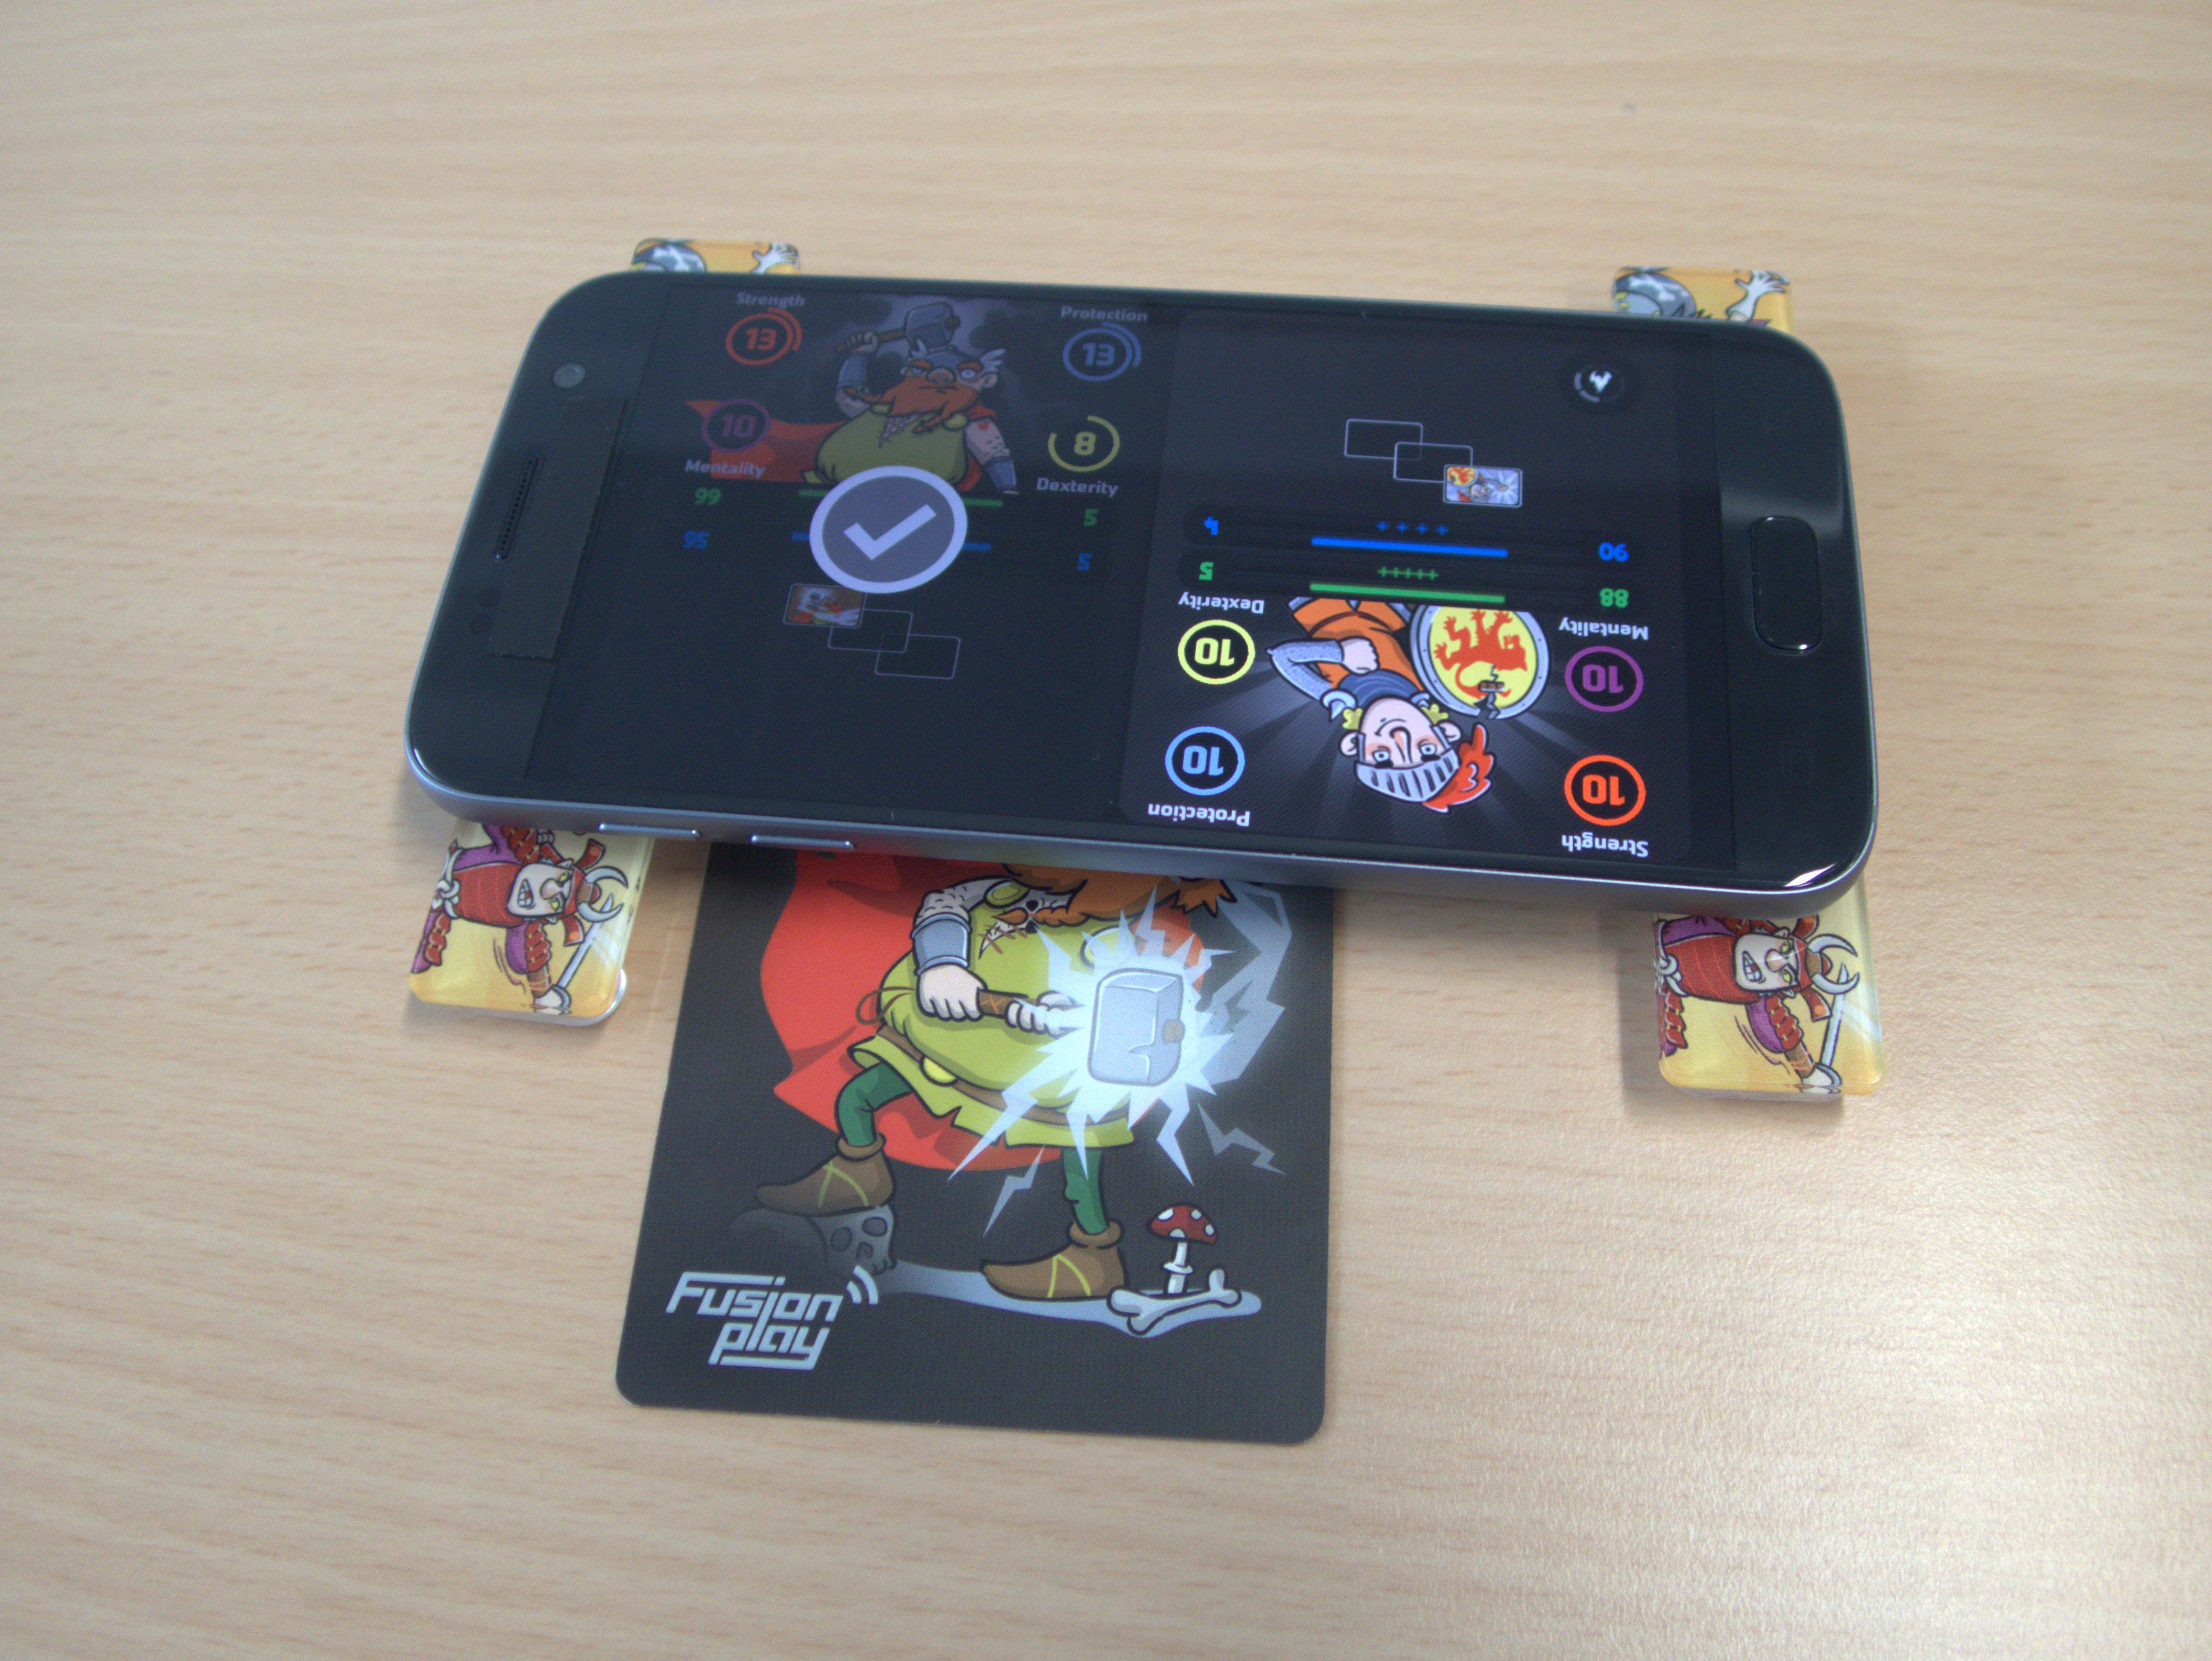 gameplay_play-card.JPG